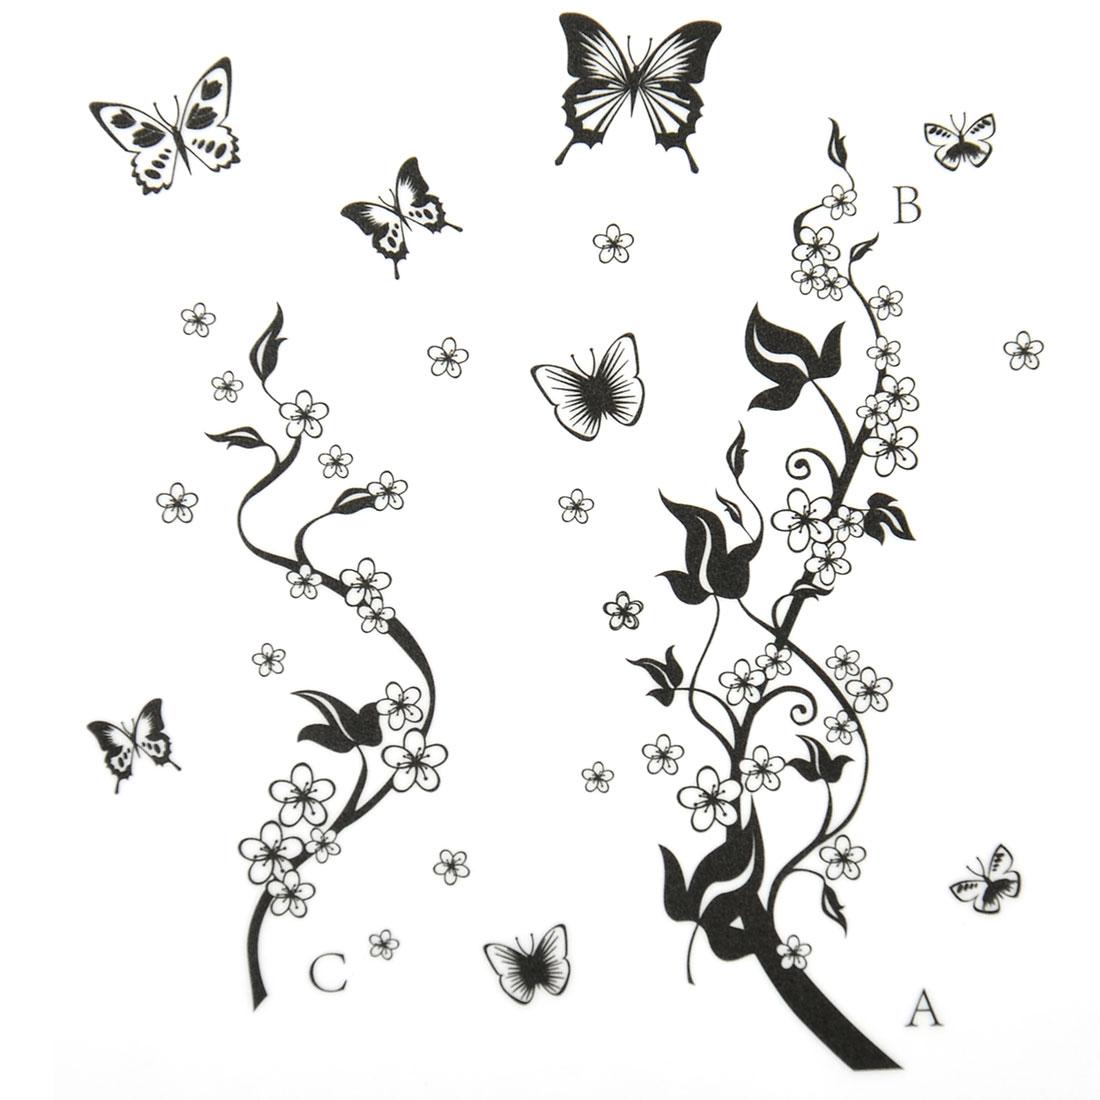 Living Room Wintersweet Pattern Wall Sticker Decal Mural Black White 90 x 60cm